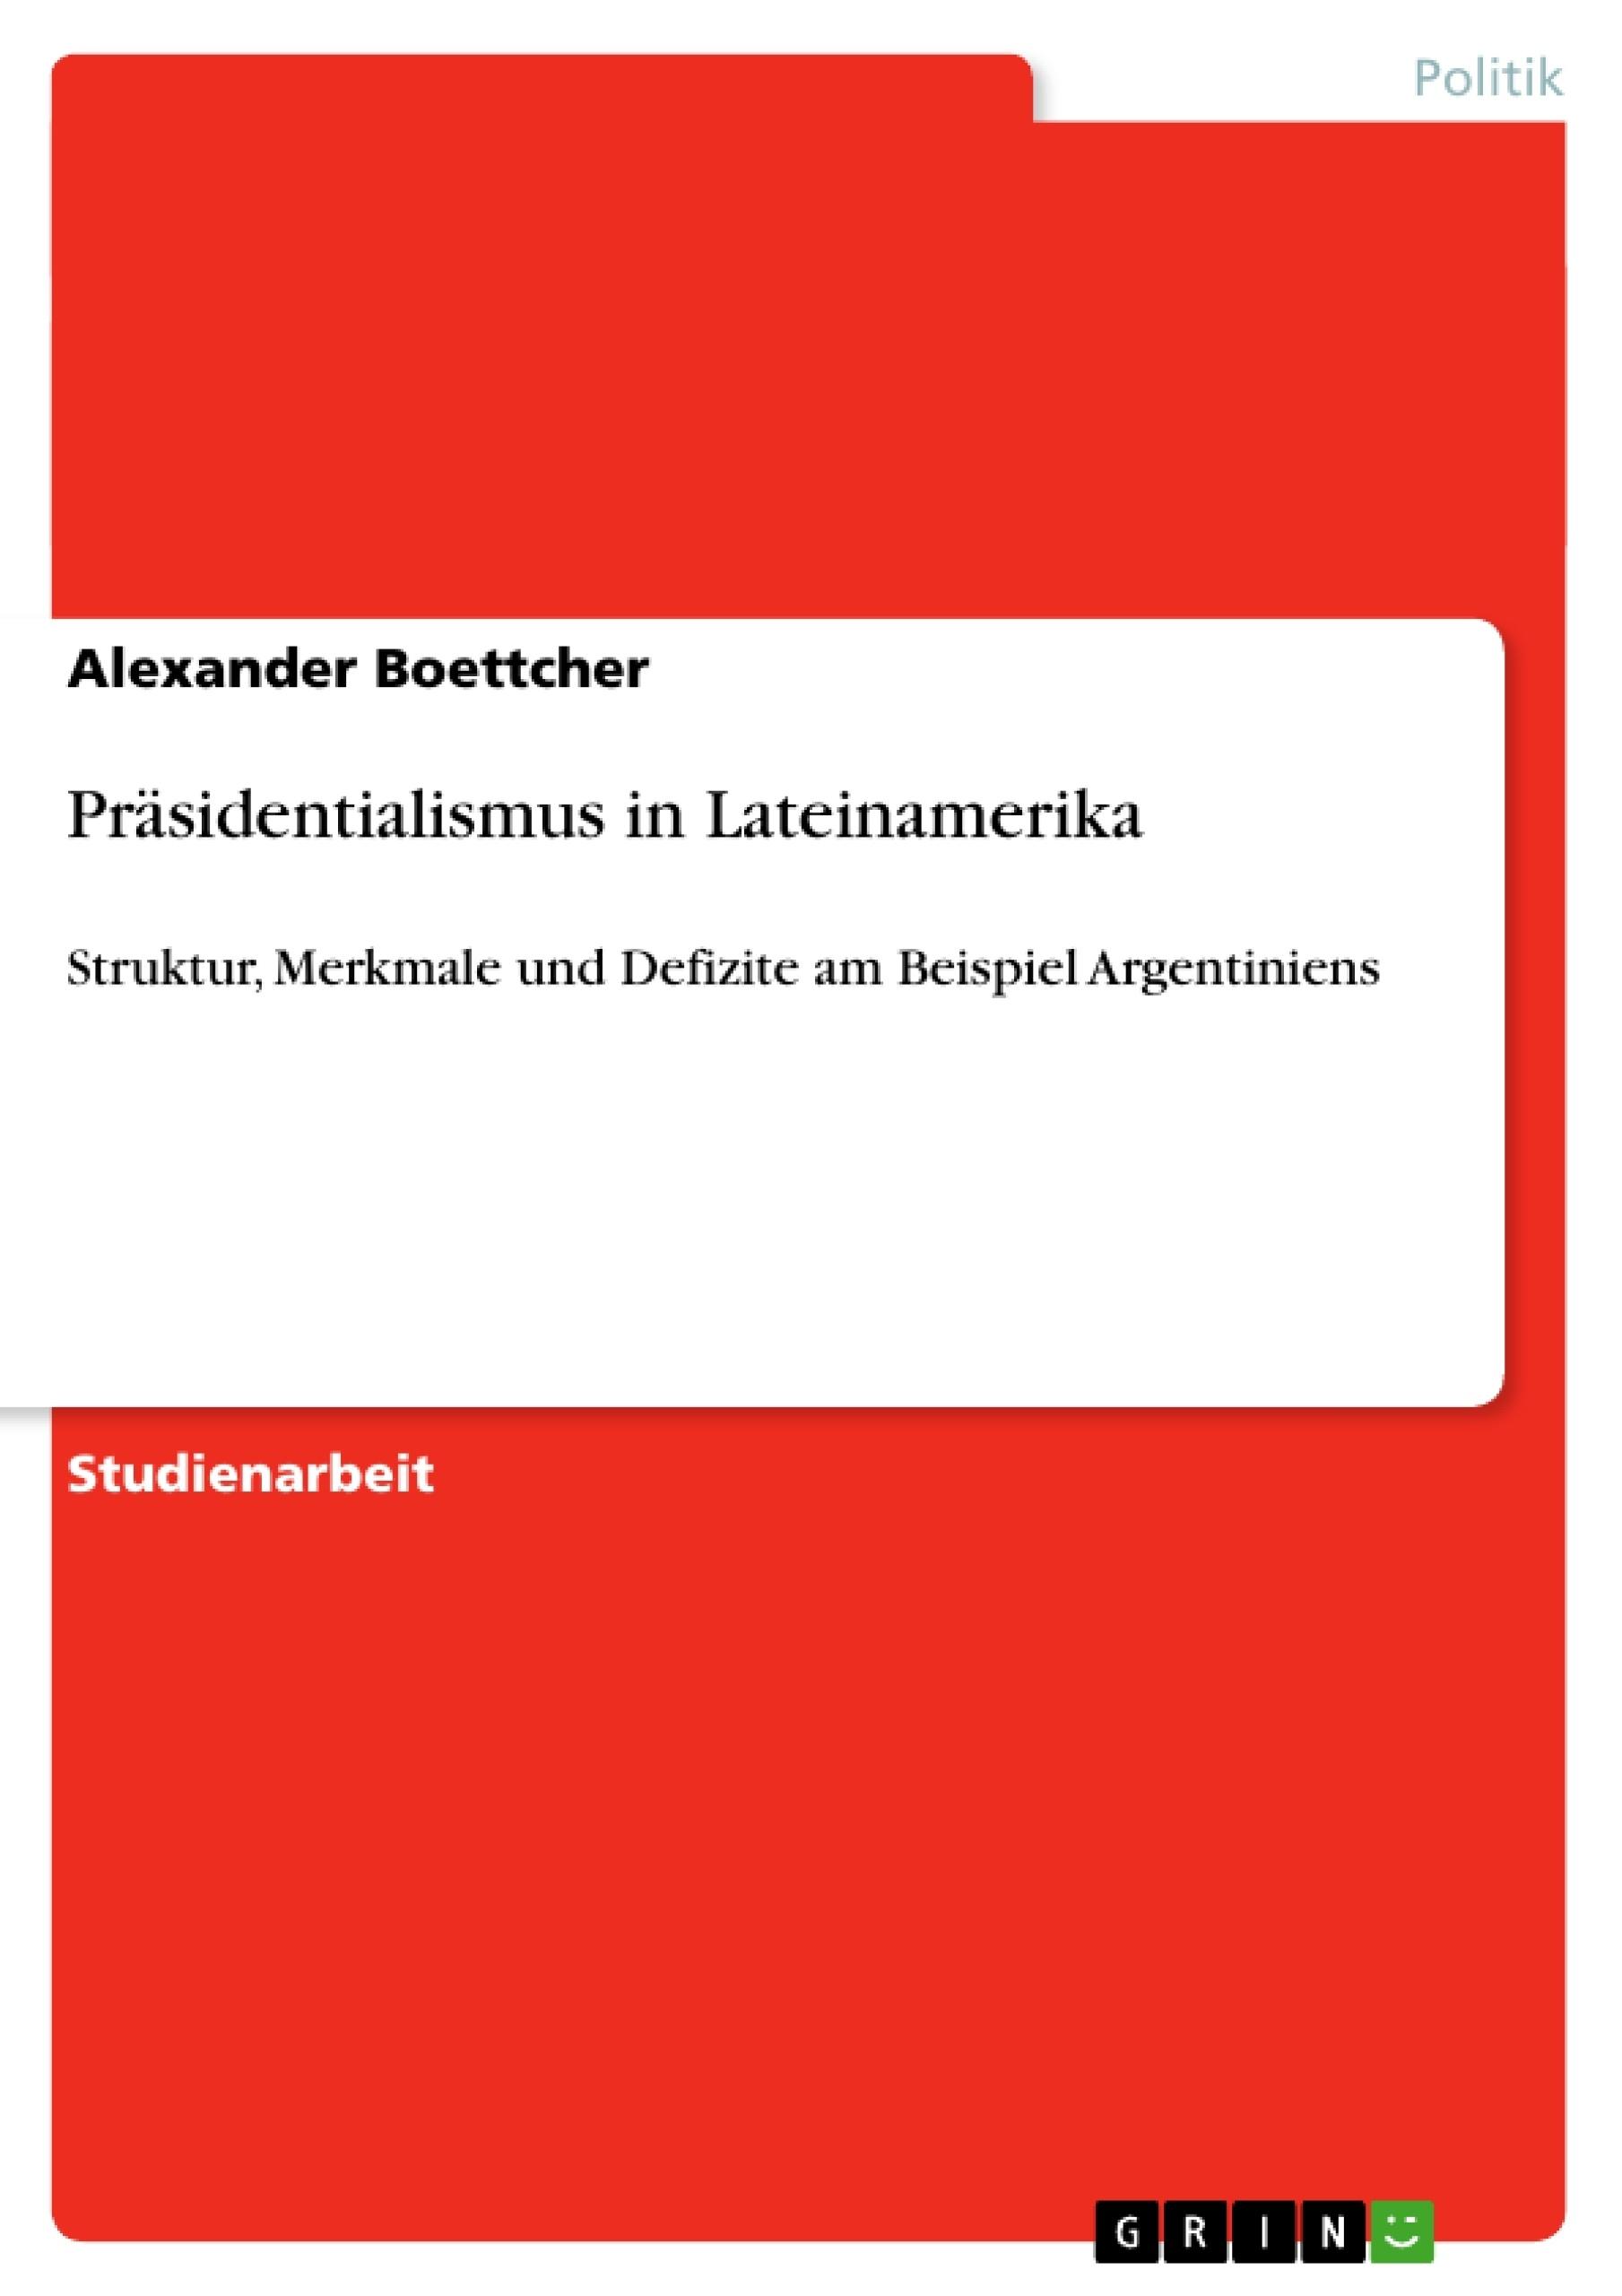 Titel: Präsidentialismus in Lateinamerika